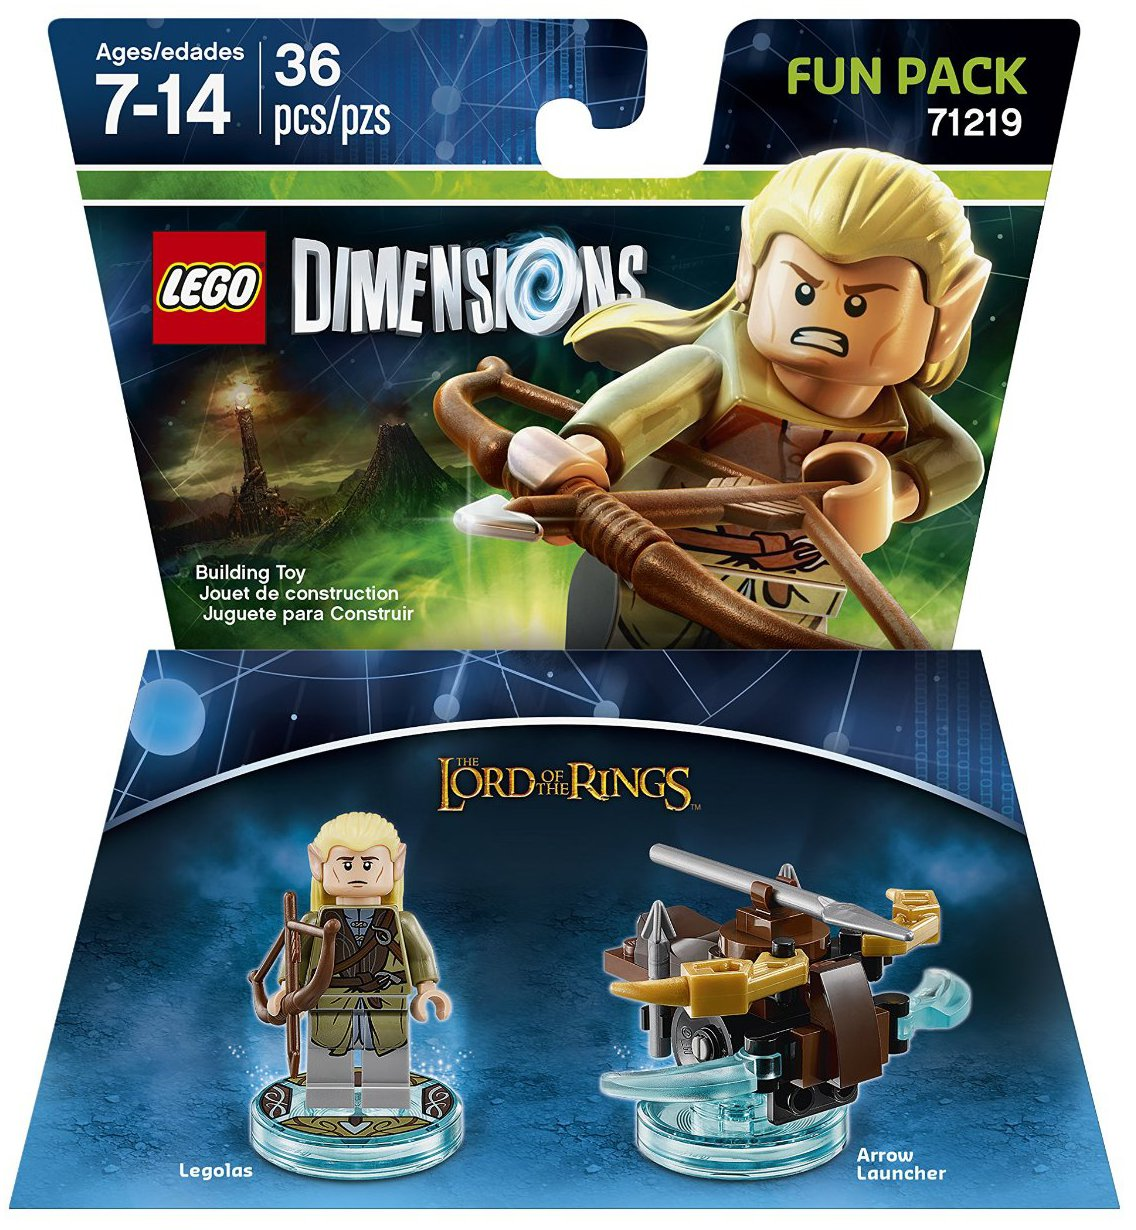 71219 Lord of the Rings Legolas Fun Pack